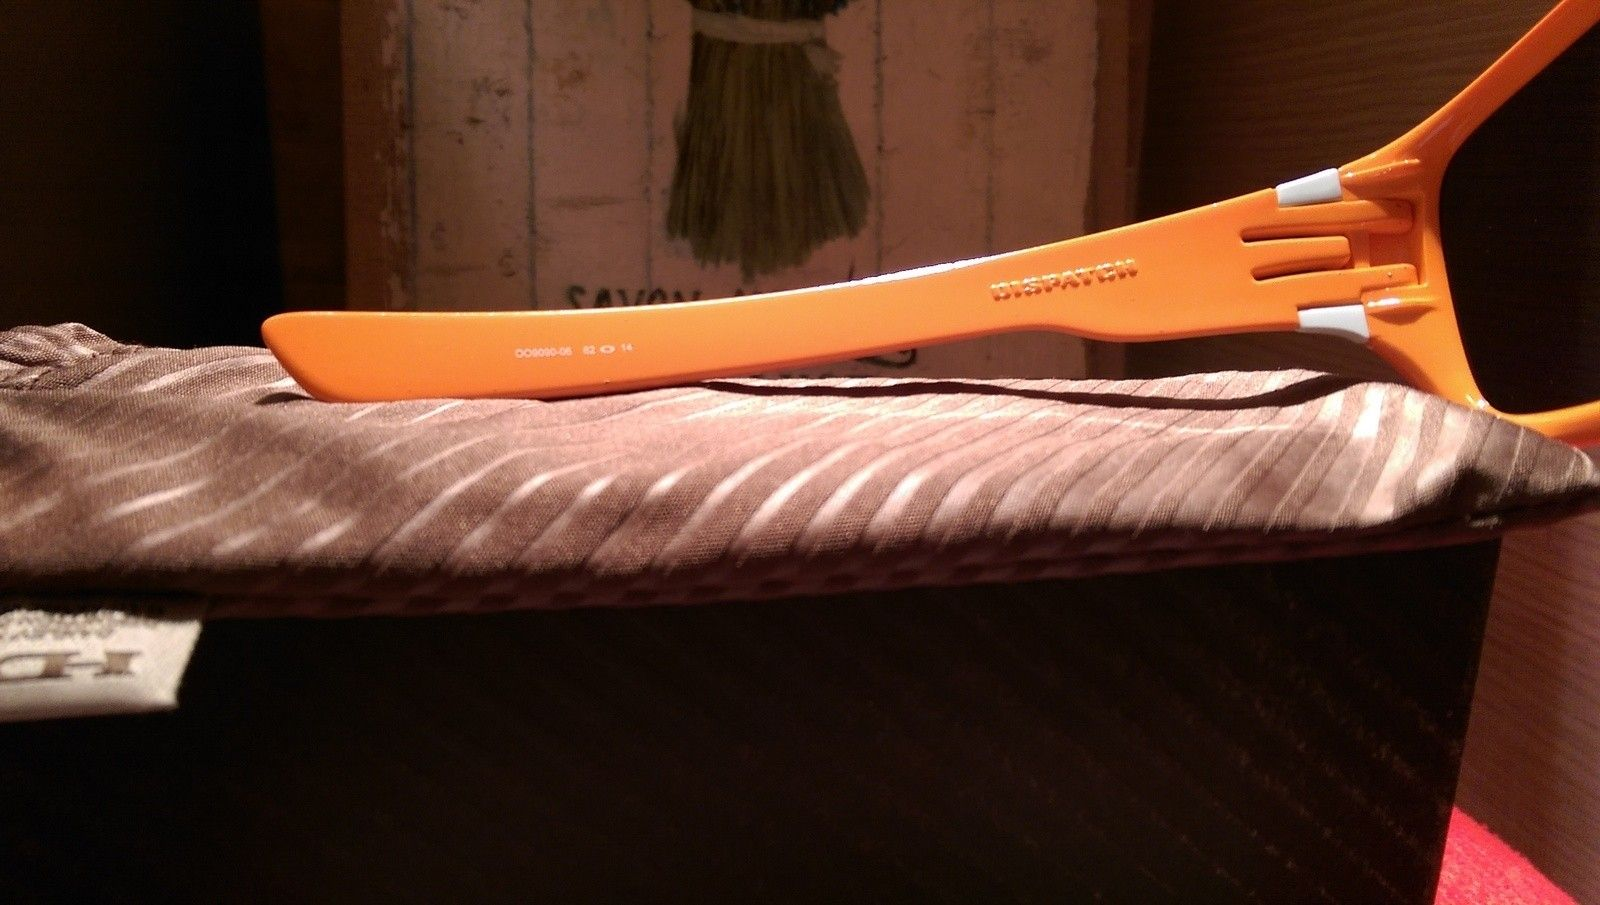 Oakley Dispatch 1 Clementine /Greyoo9090-06 BNIB - IMAG4841.jpg